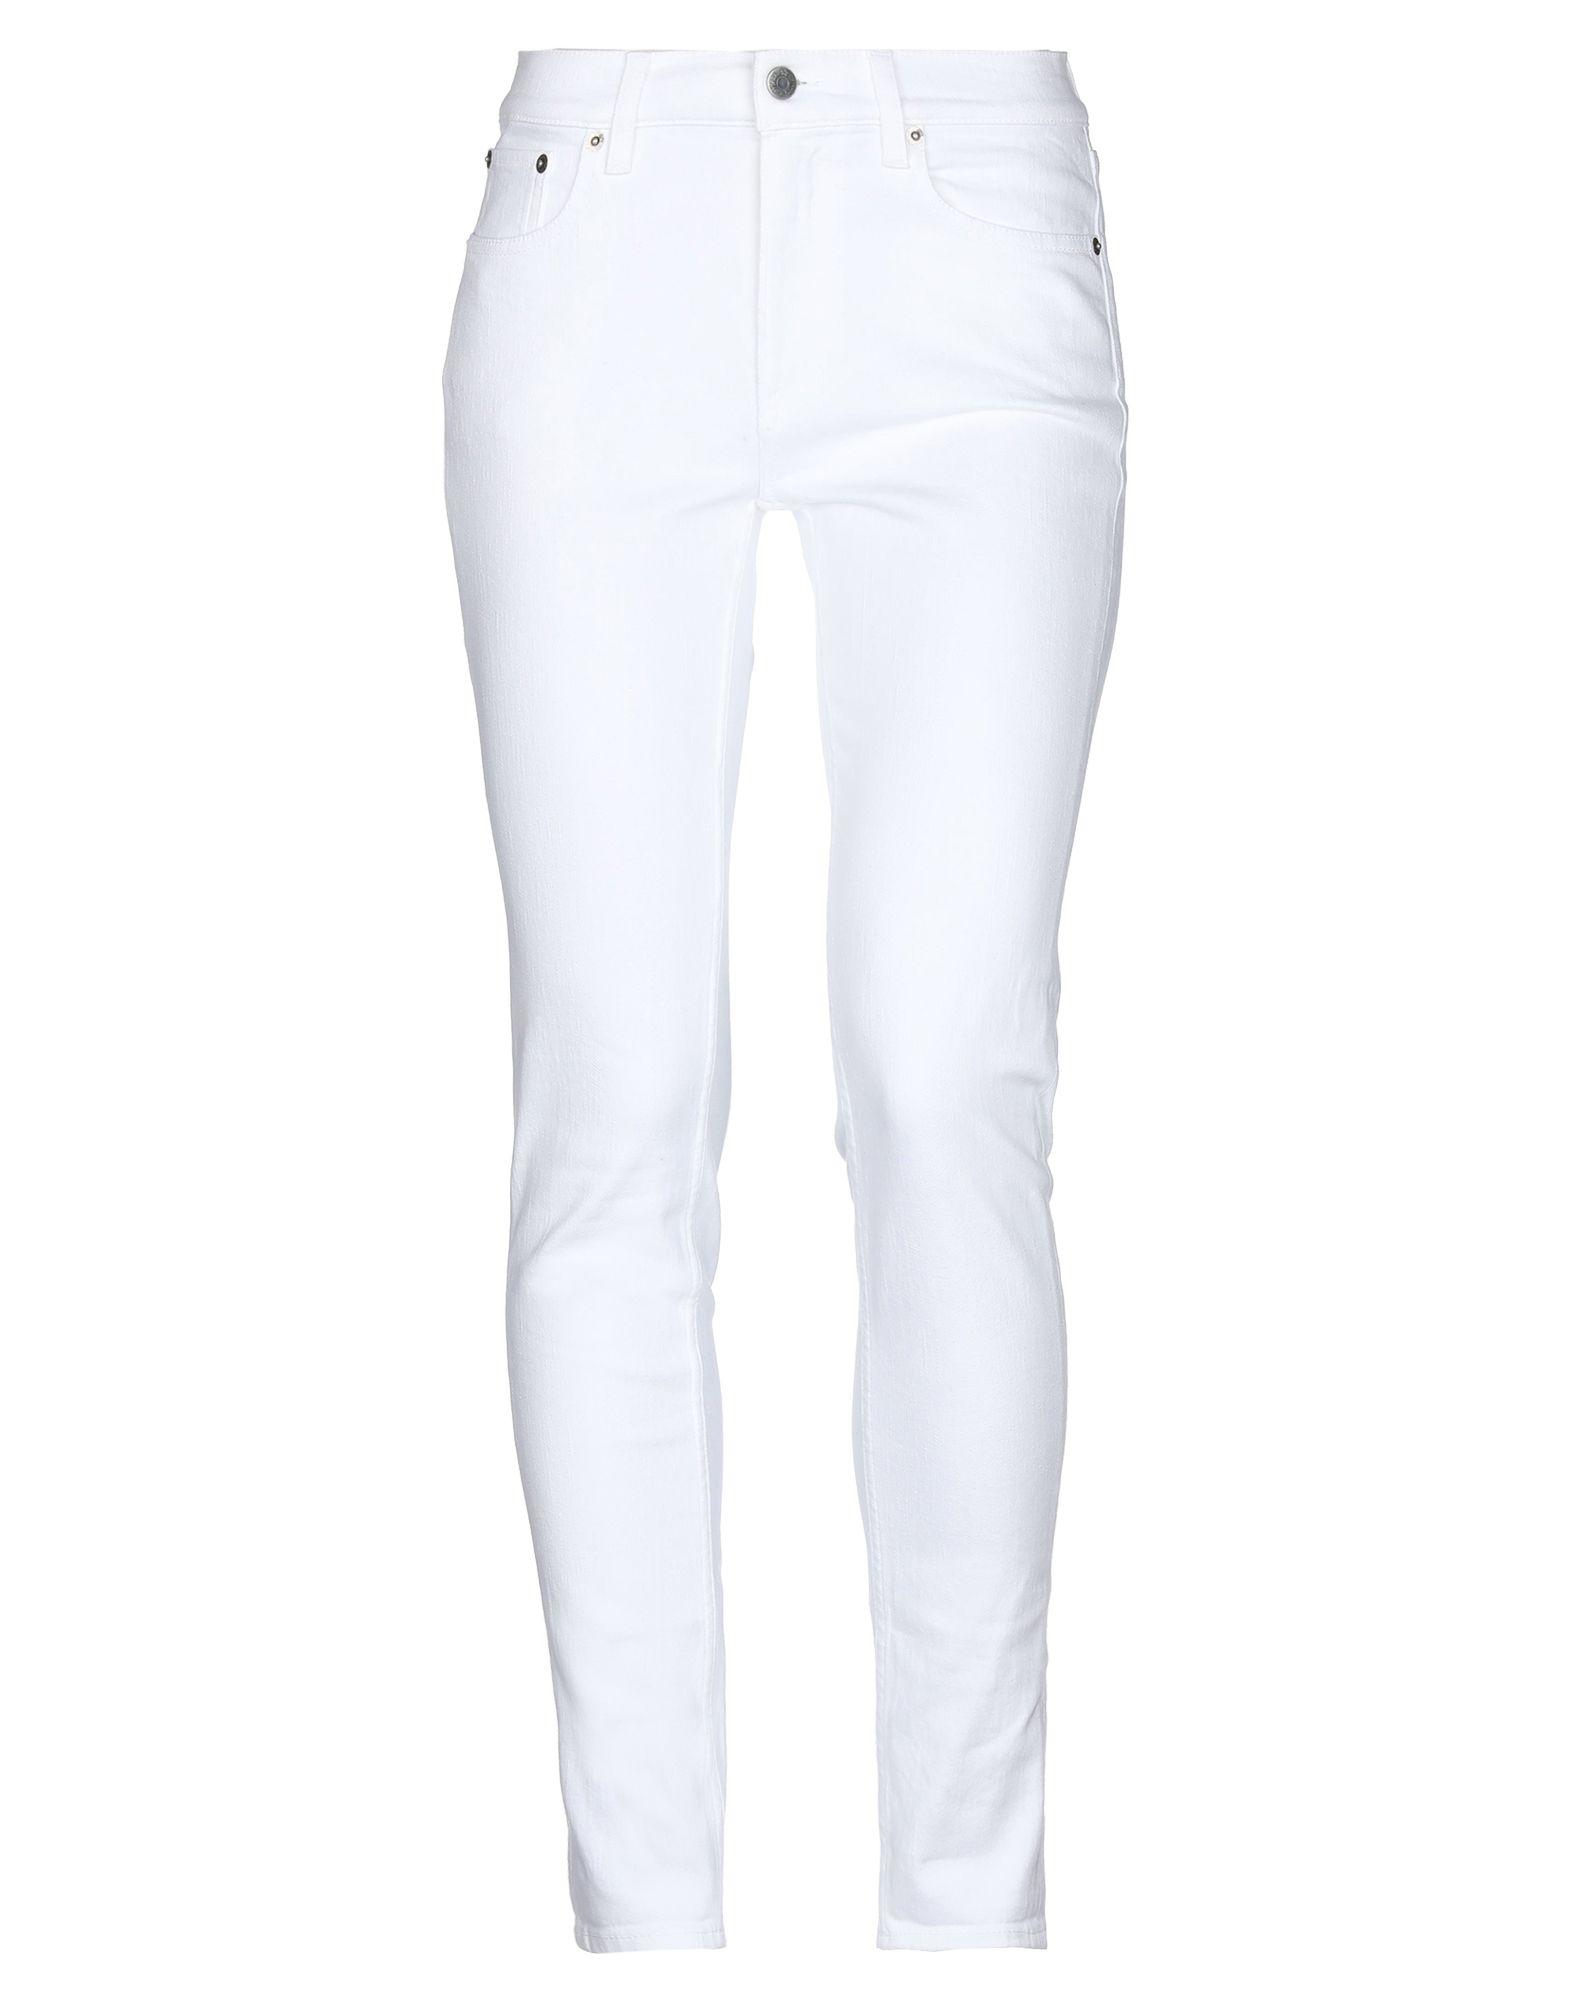 RALPH LAUREN COLLECTION Джинсовые брюки